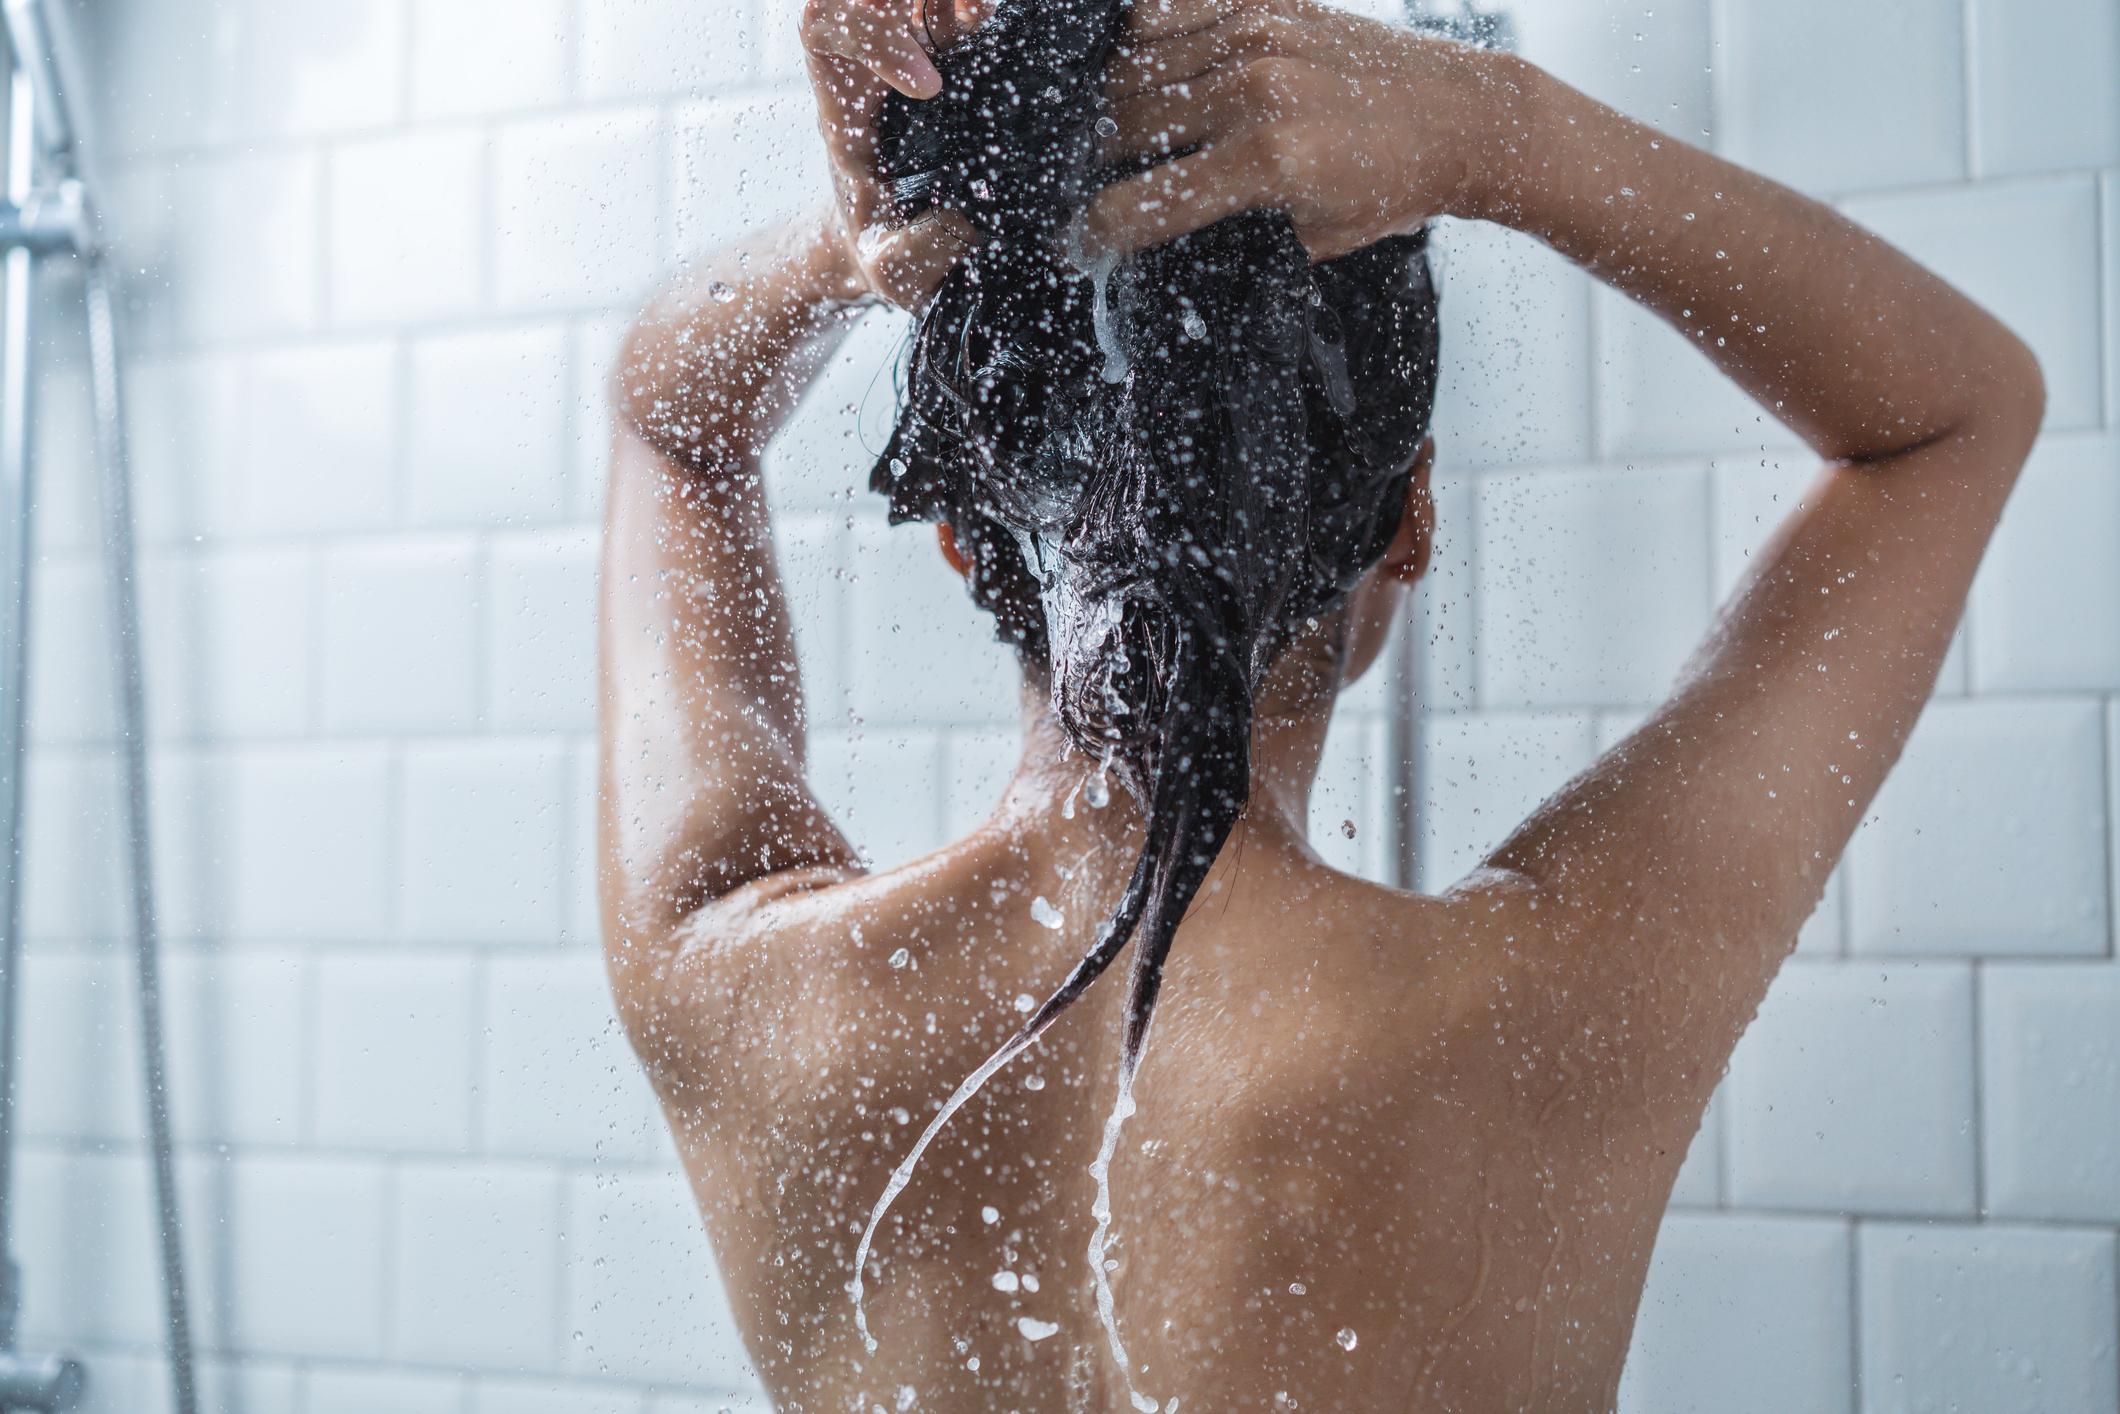 Asian women bathing and she was bathing and washing hair.